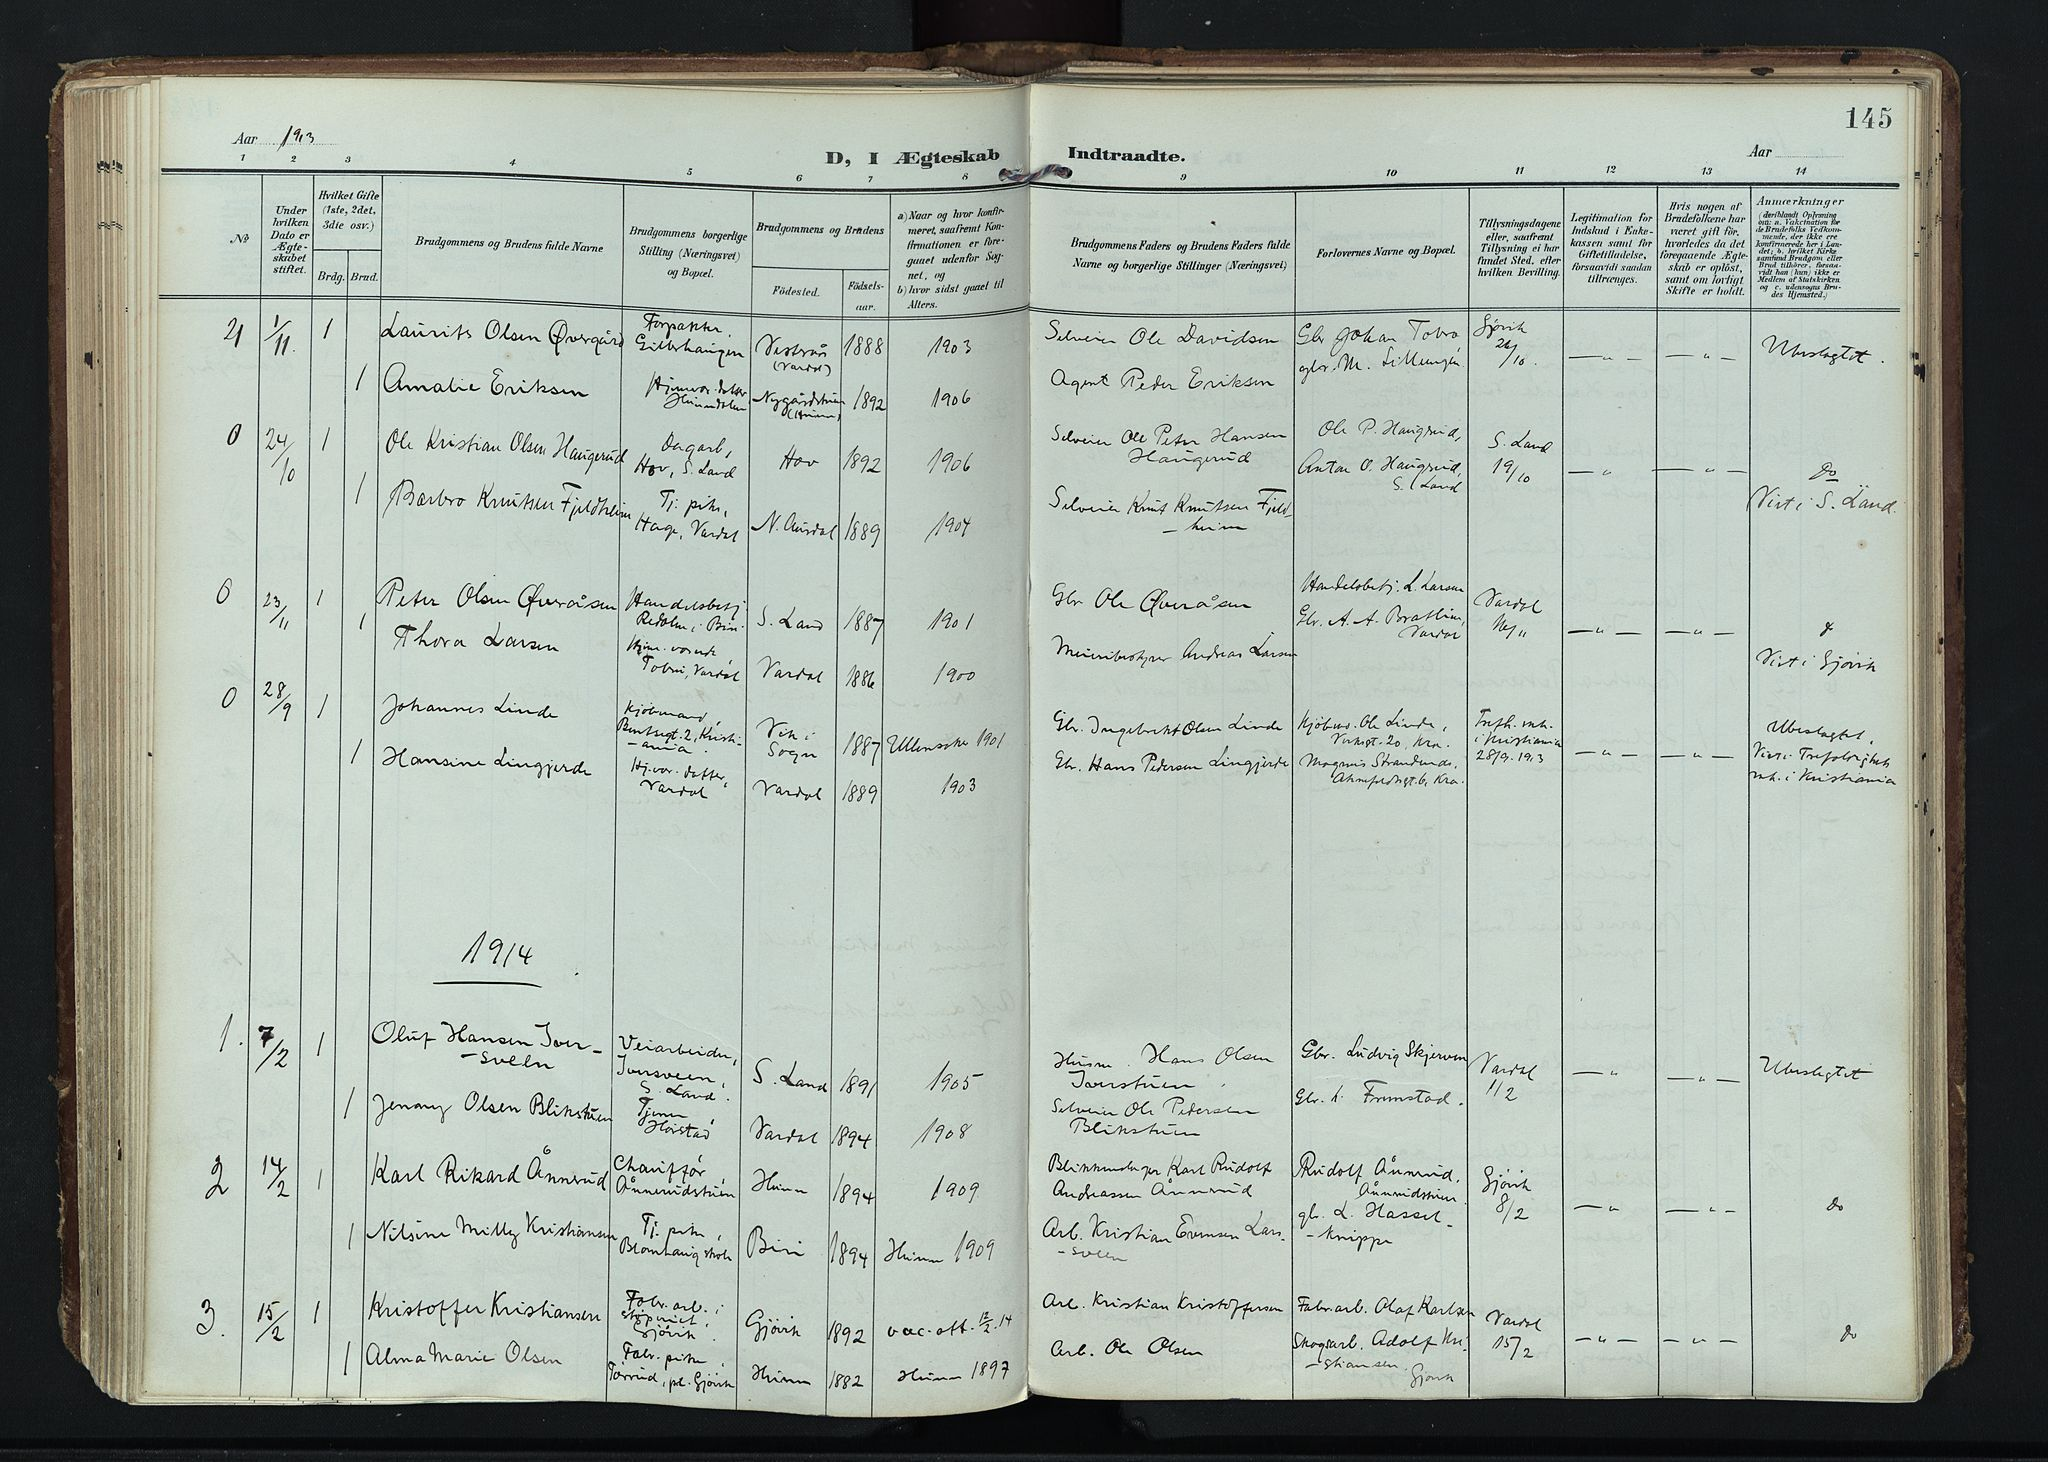 SAH, Vardal prestekontor, H/Ha/Haa/L0020: Ministerialbok nr. 20, 1907-1921, s. 145